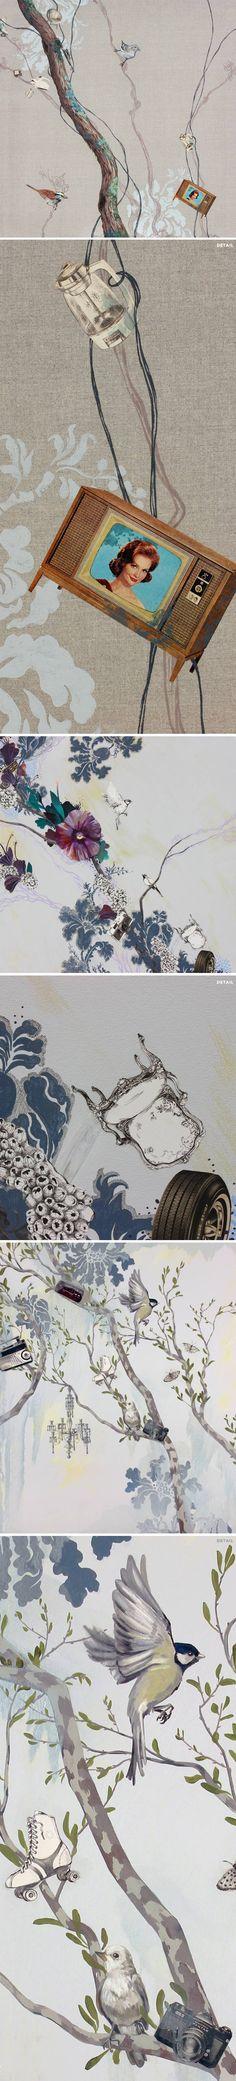 The Jealous Curator /// curated contemporary art /// lauren matsumoto